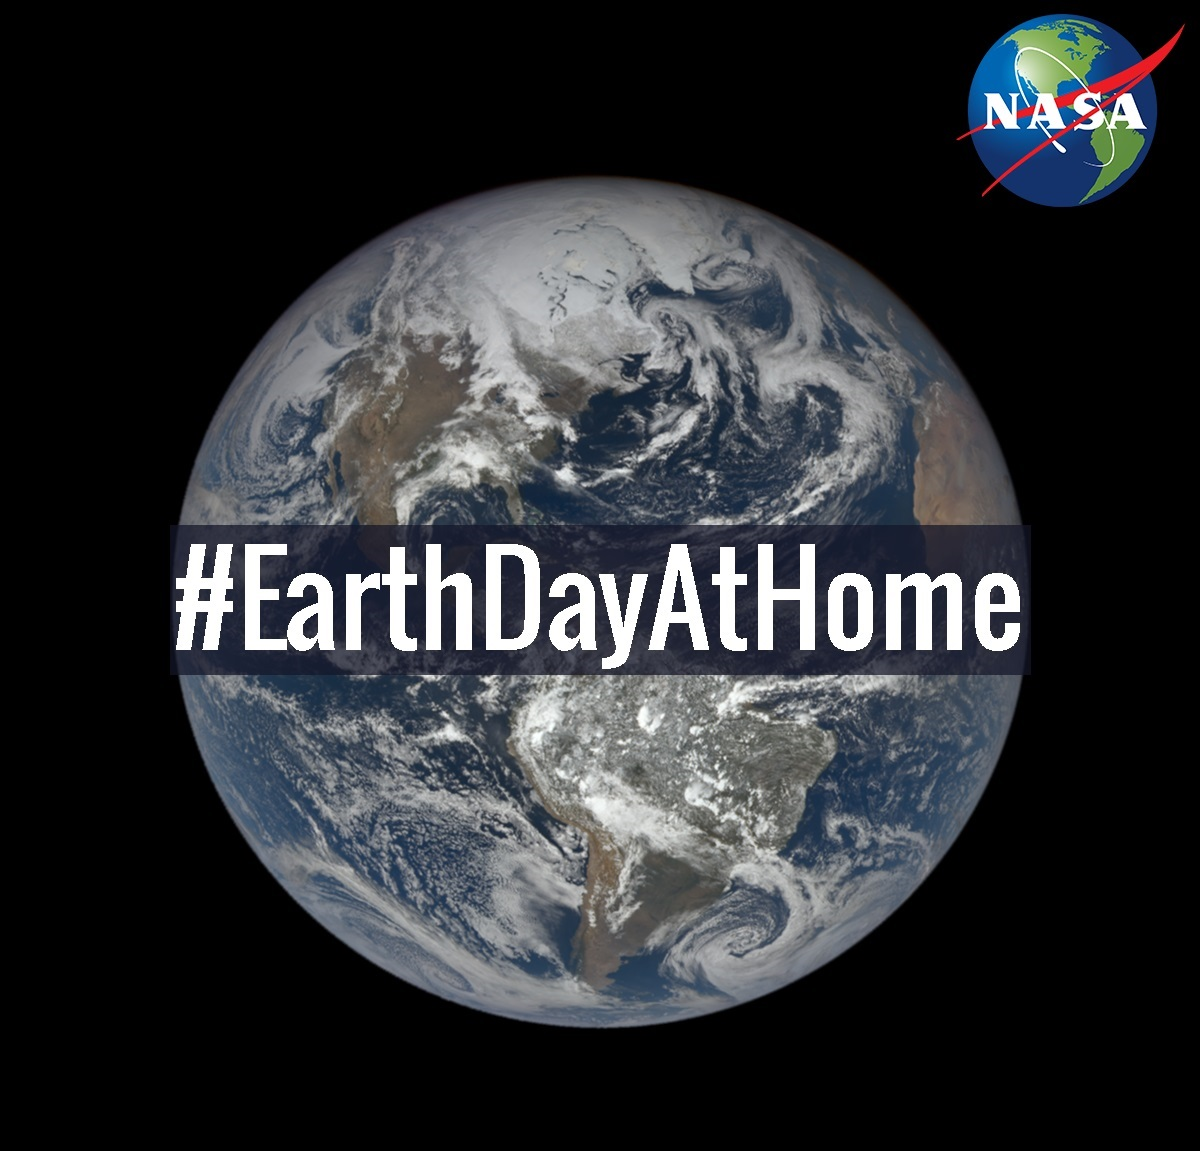 NASA marks 50th anniversary of Earth Day with #EarthDayAtHome